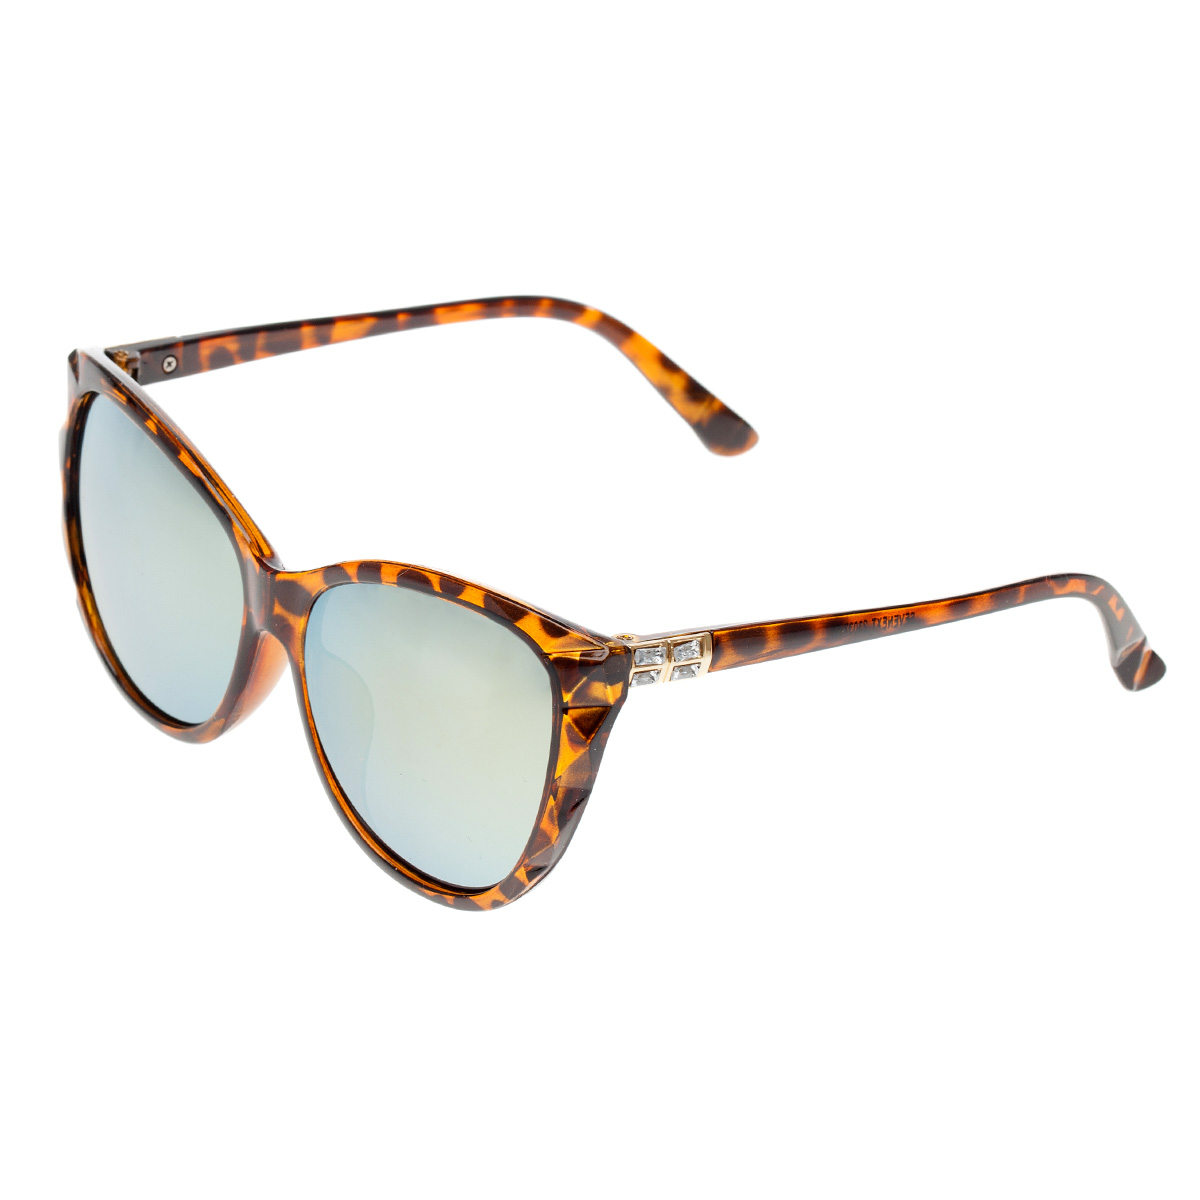 Фото - Очки солнцезащитные Sevenext, 23032-58 очки солнцезащитные sevenext 23032 28